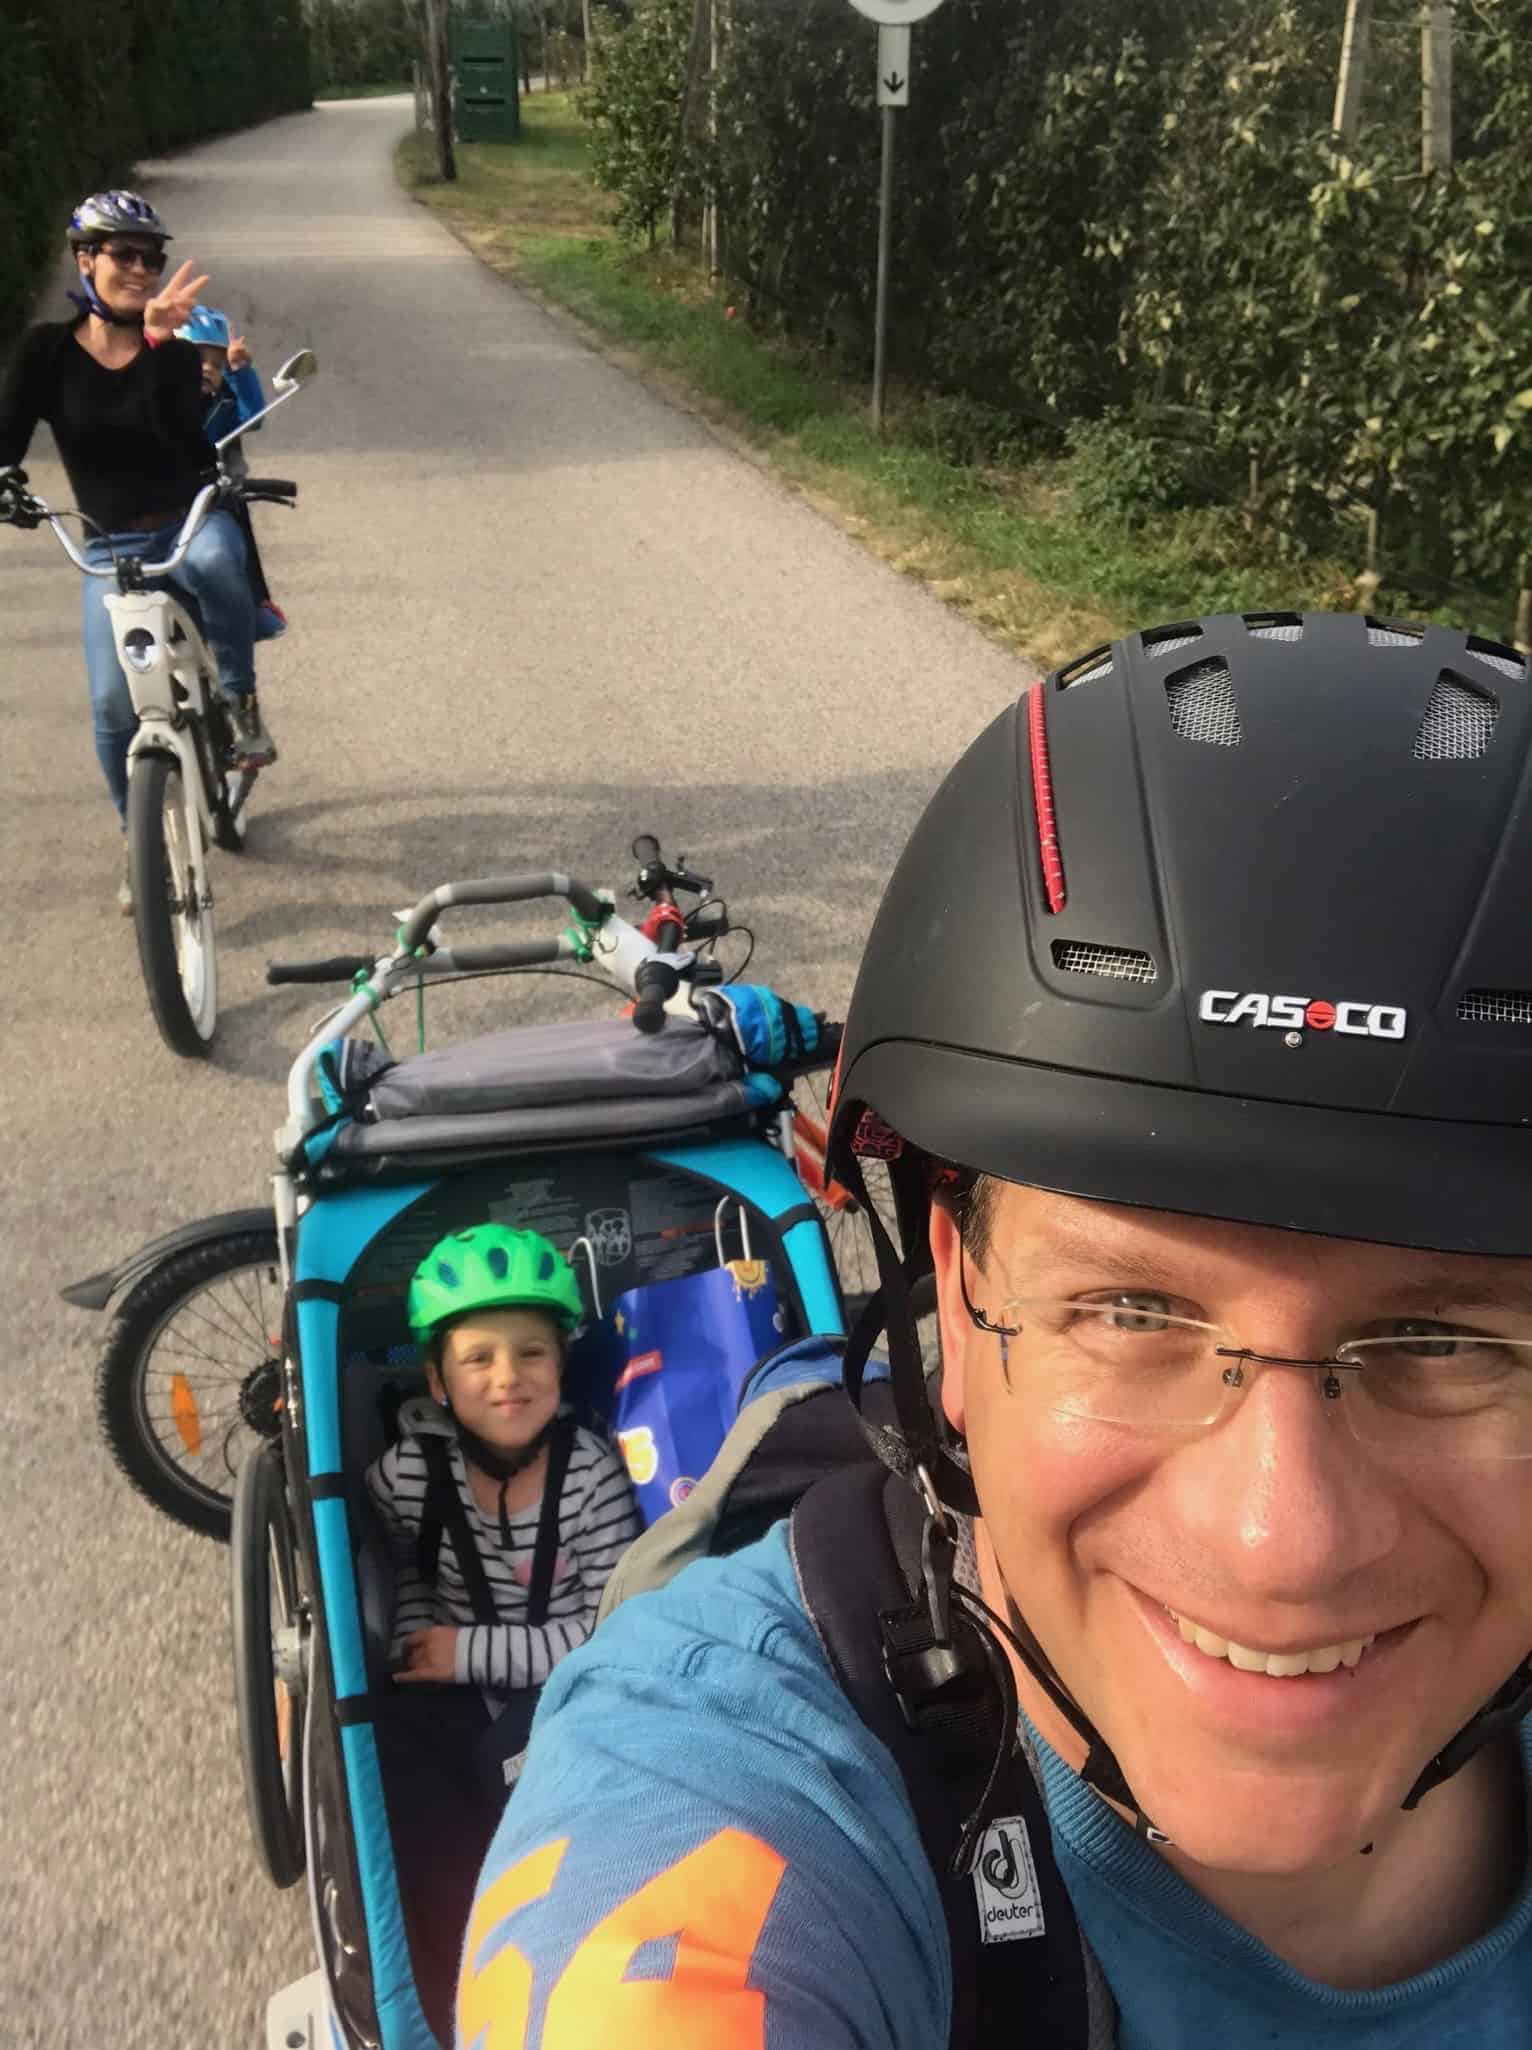 Familienurlaub mit dem E-Bike youmo.ch